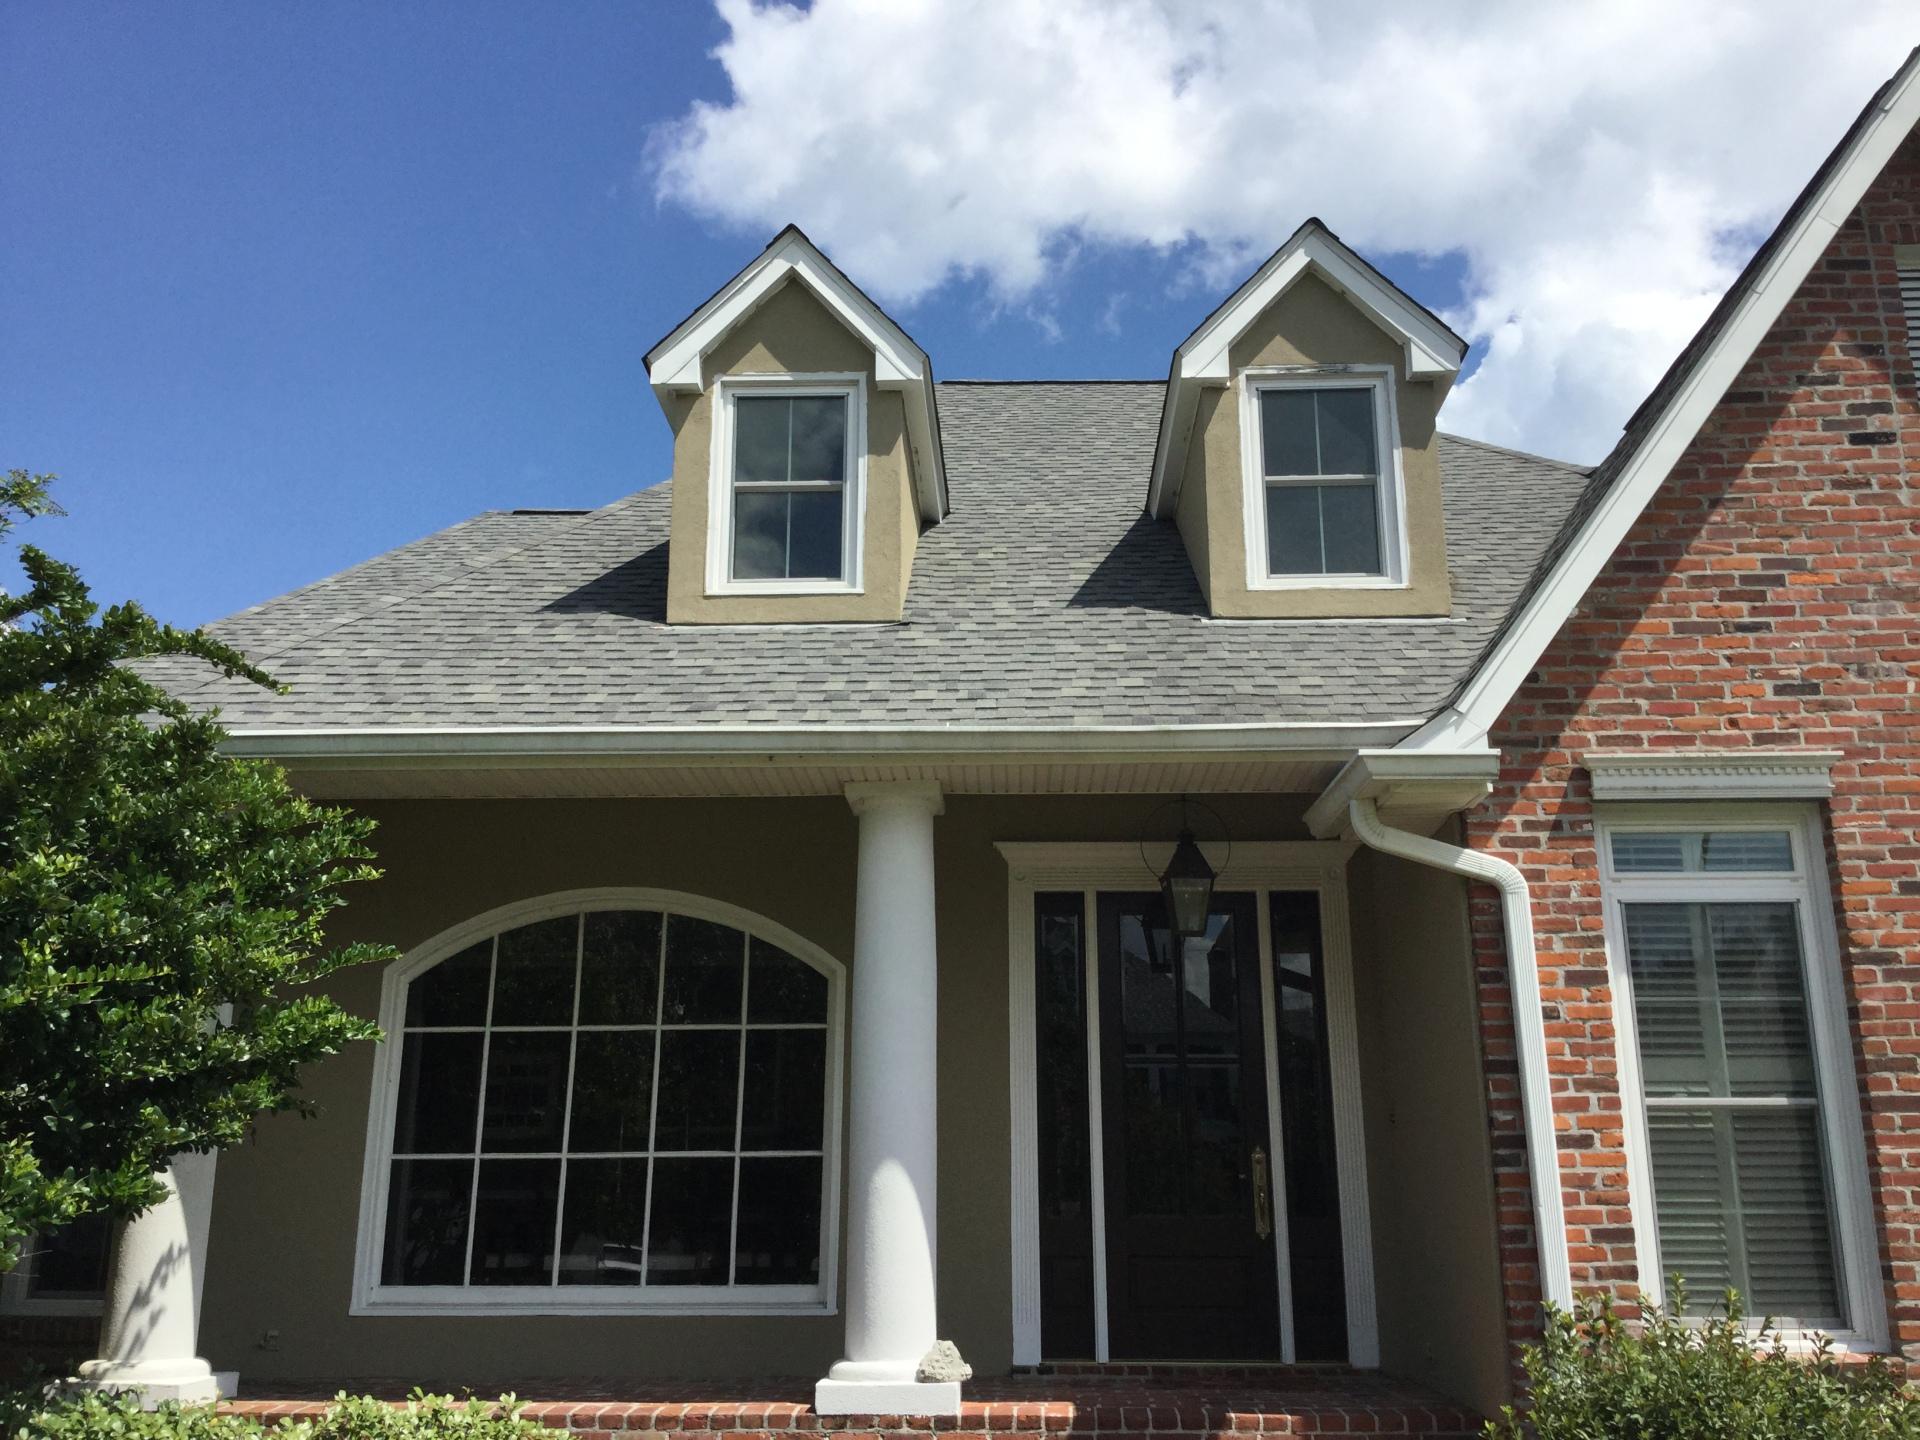 roof cleaning, softwashing, pressure washing, pressure washing roof cleaning, klean roof, roof kleaning, pressure washing, cleaning